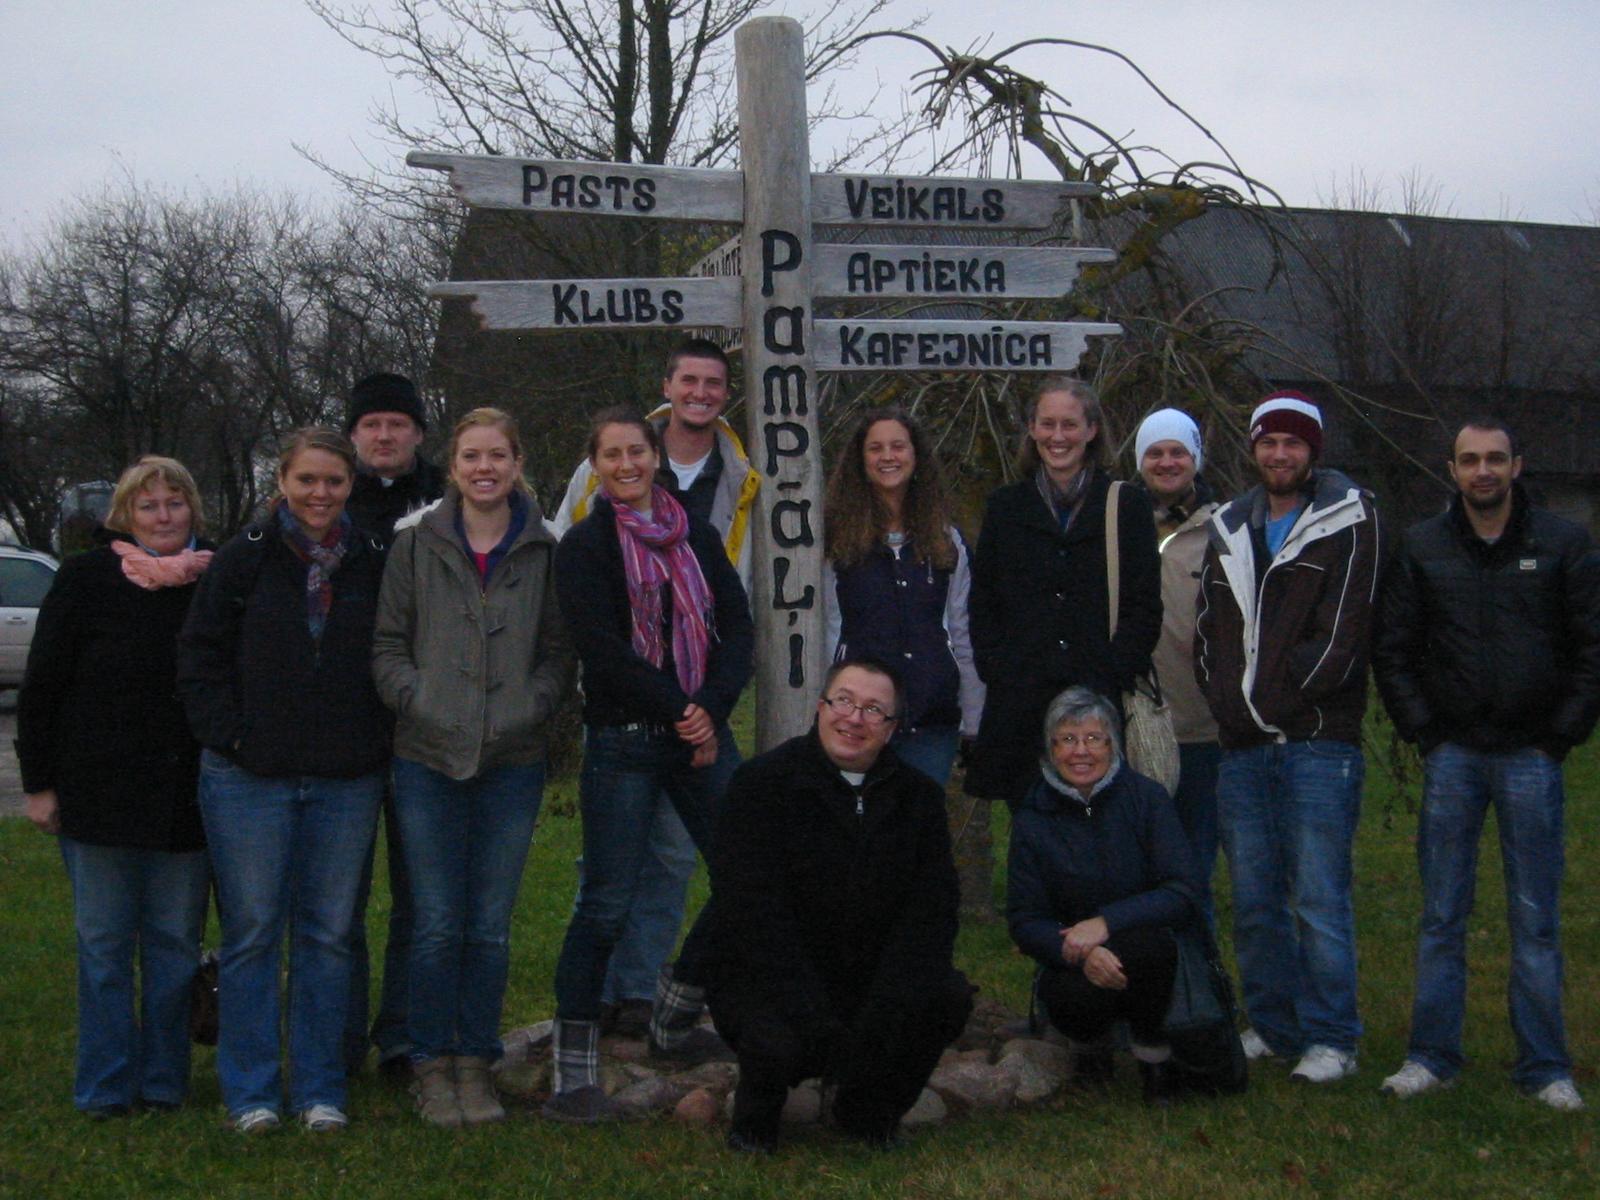 Concordia students in latvia